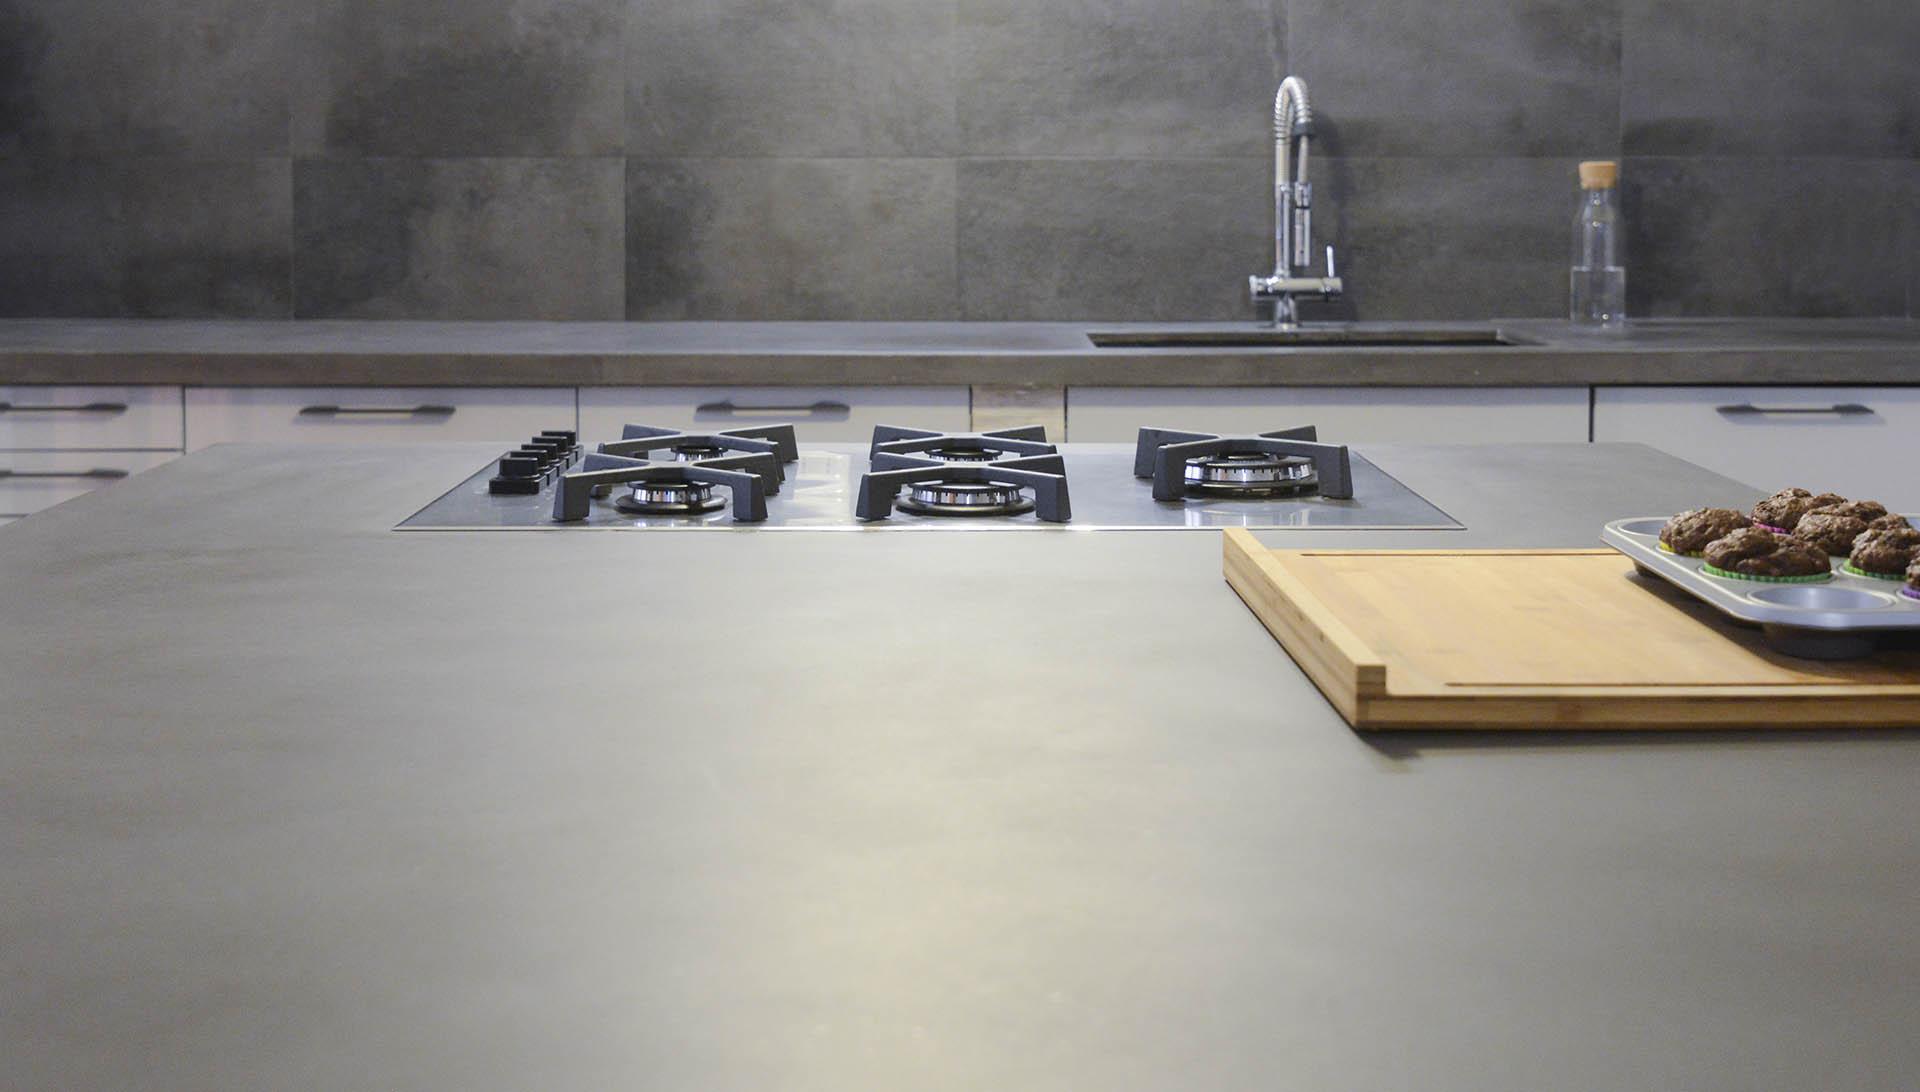 Misure Standard Top Cucina cemento line - piani cucina in cemento made in italy